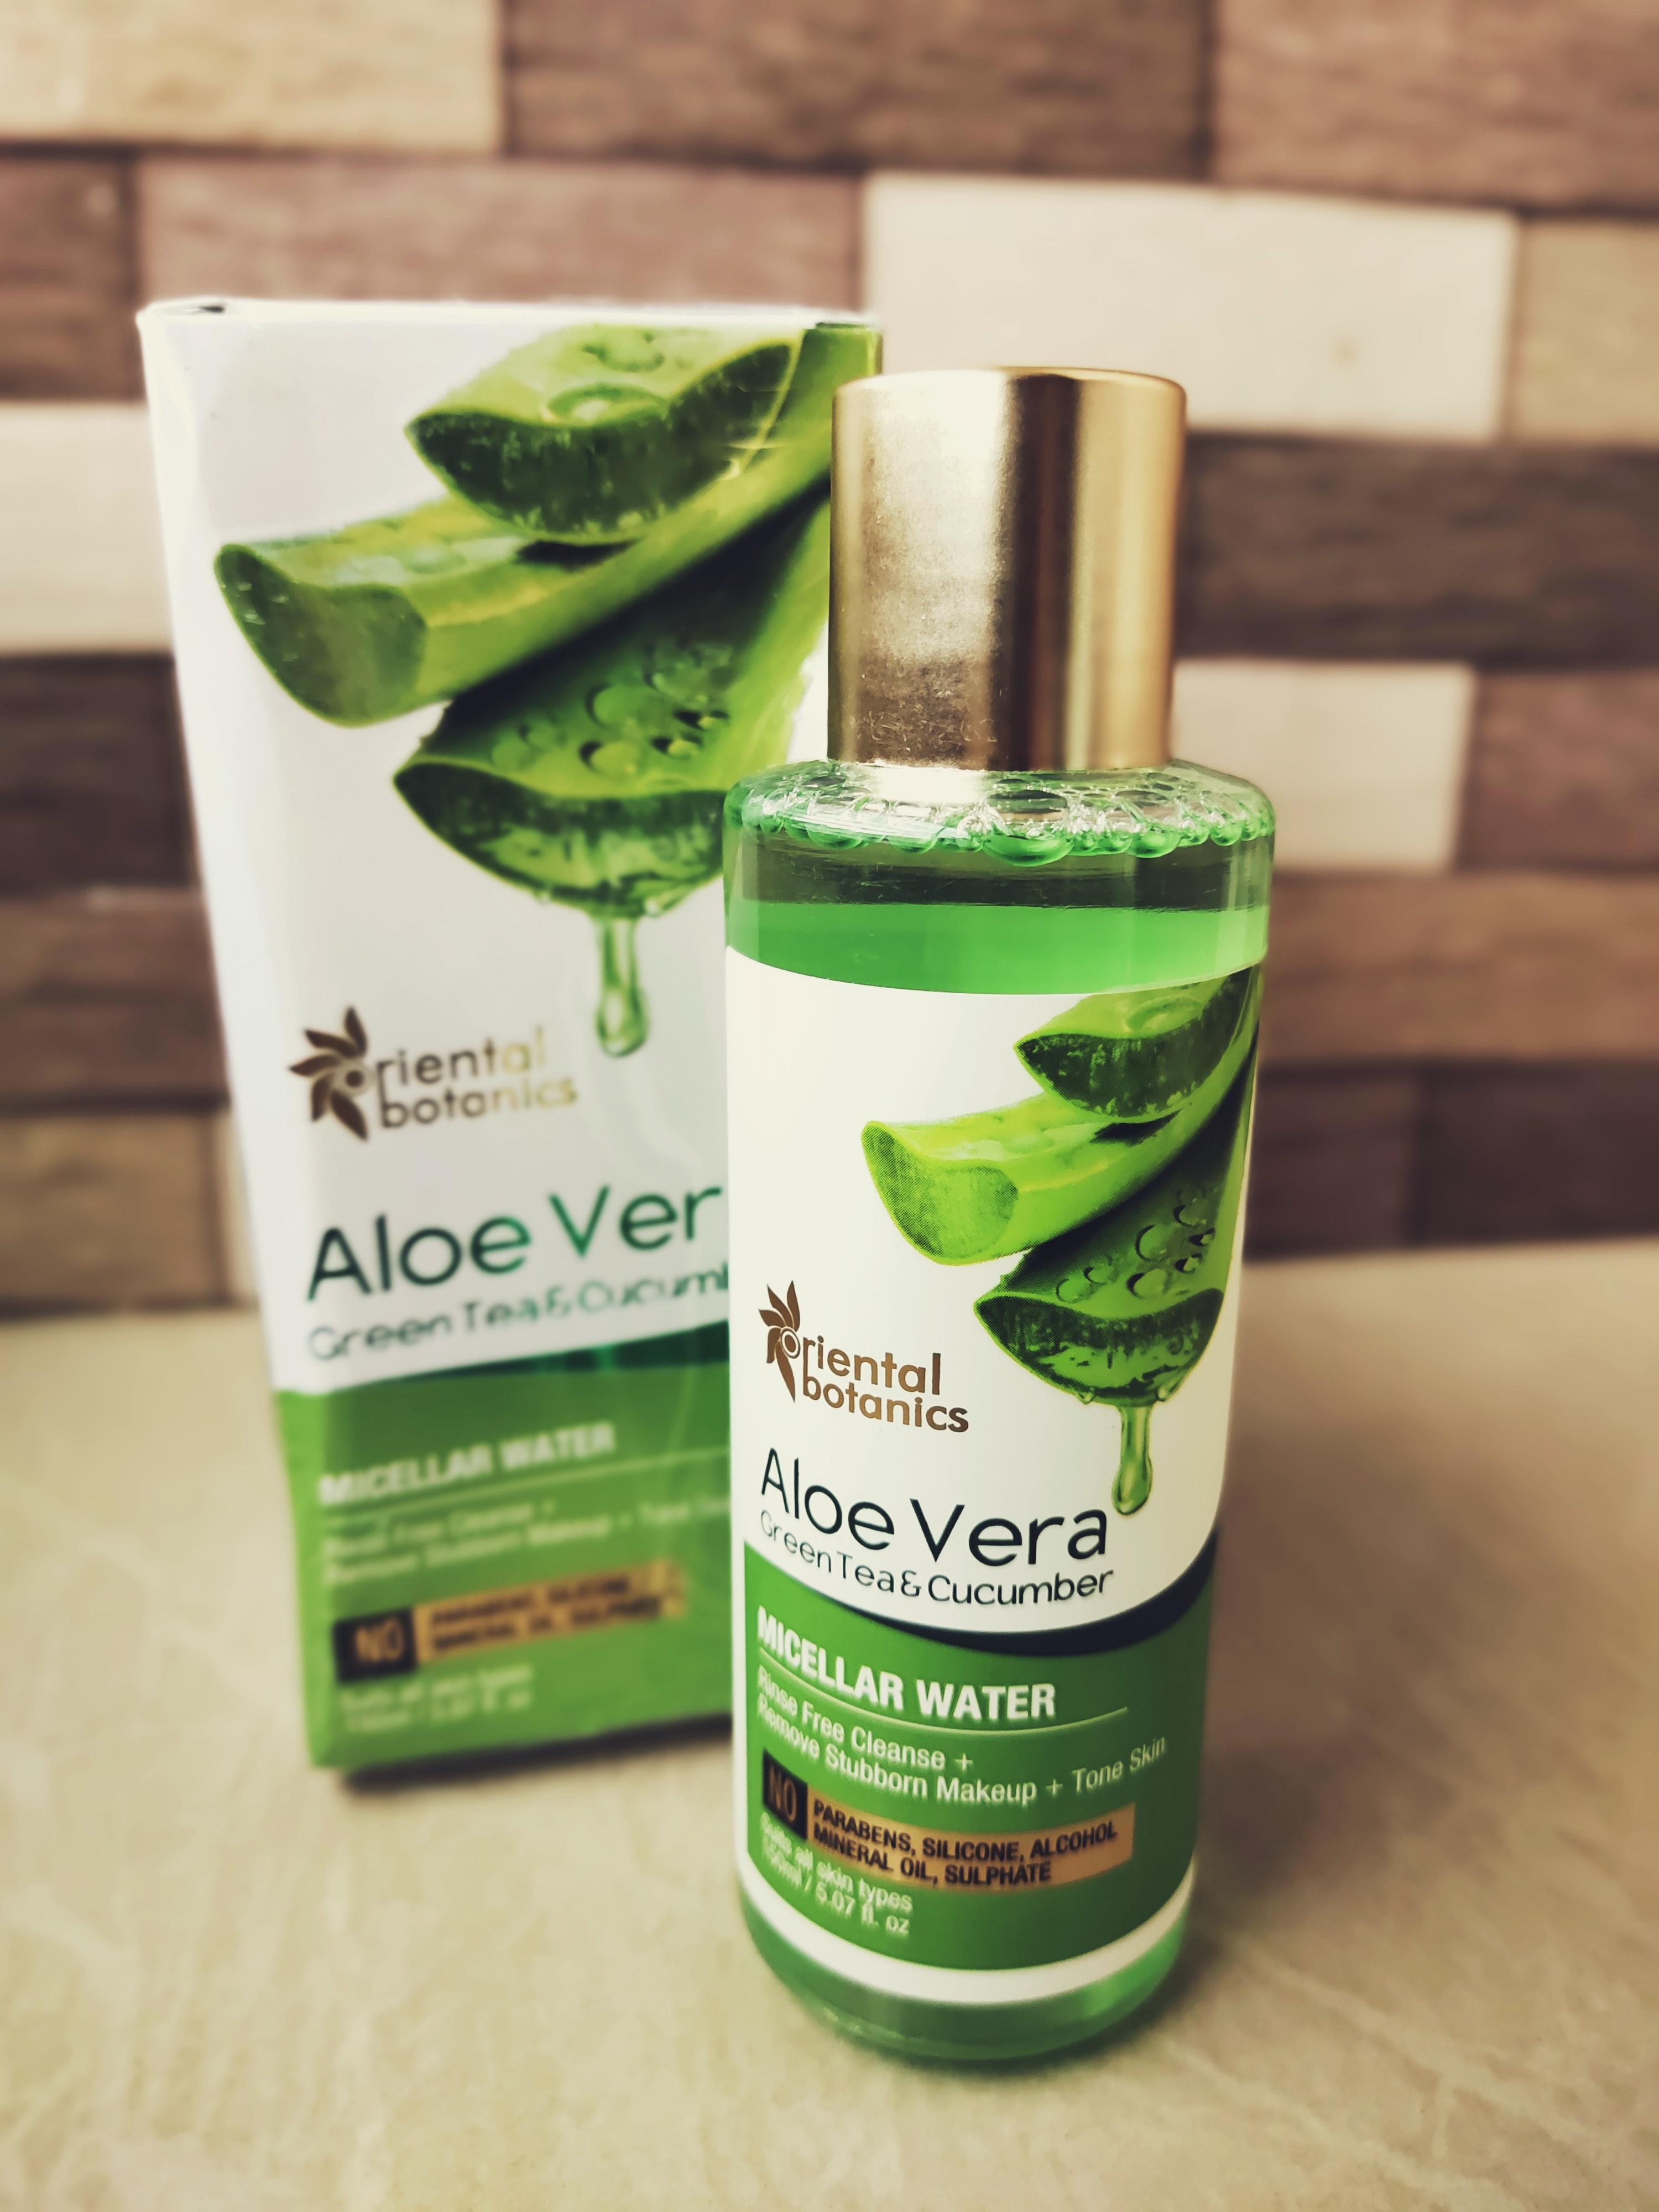 Oriental Botanics Aloe Vera, Green Tea & Cucumber Micellar Water -Best Natural Make-up remover-By sairekha